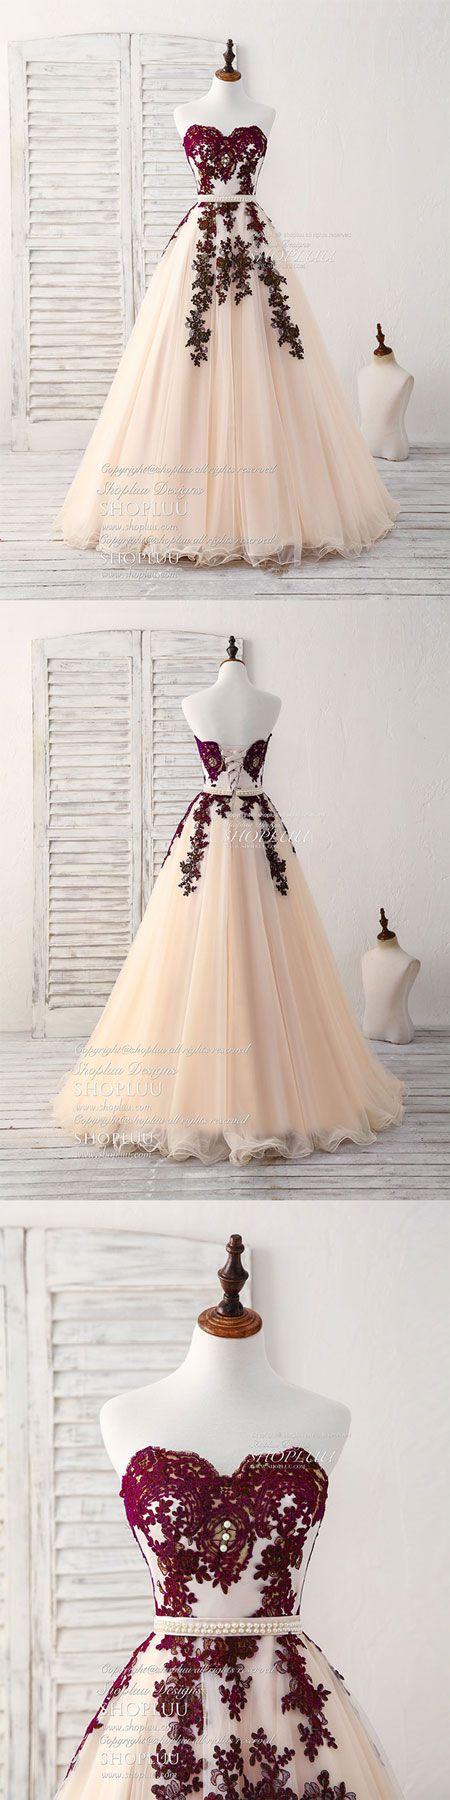 Burgundy sweetheart tulle long prom dress, burgundy evening dress